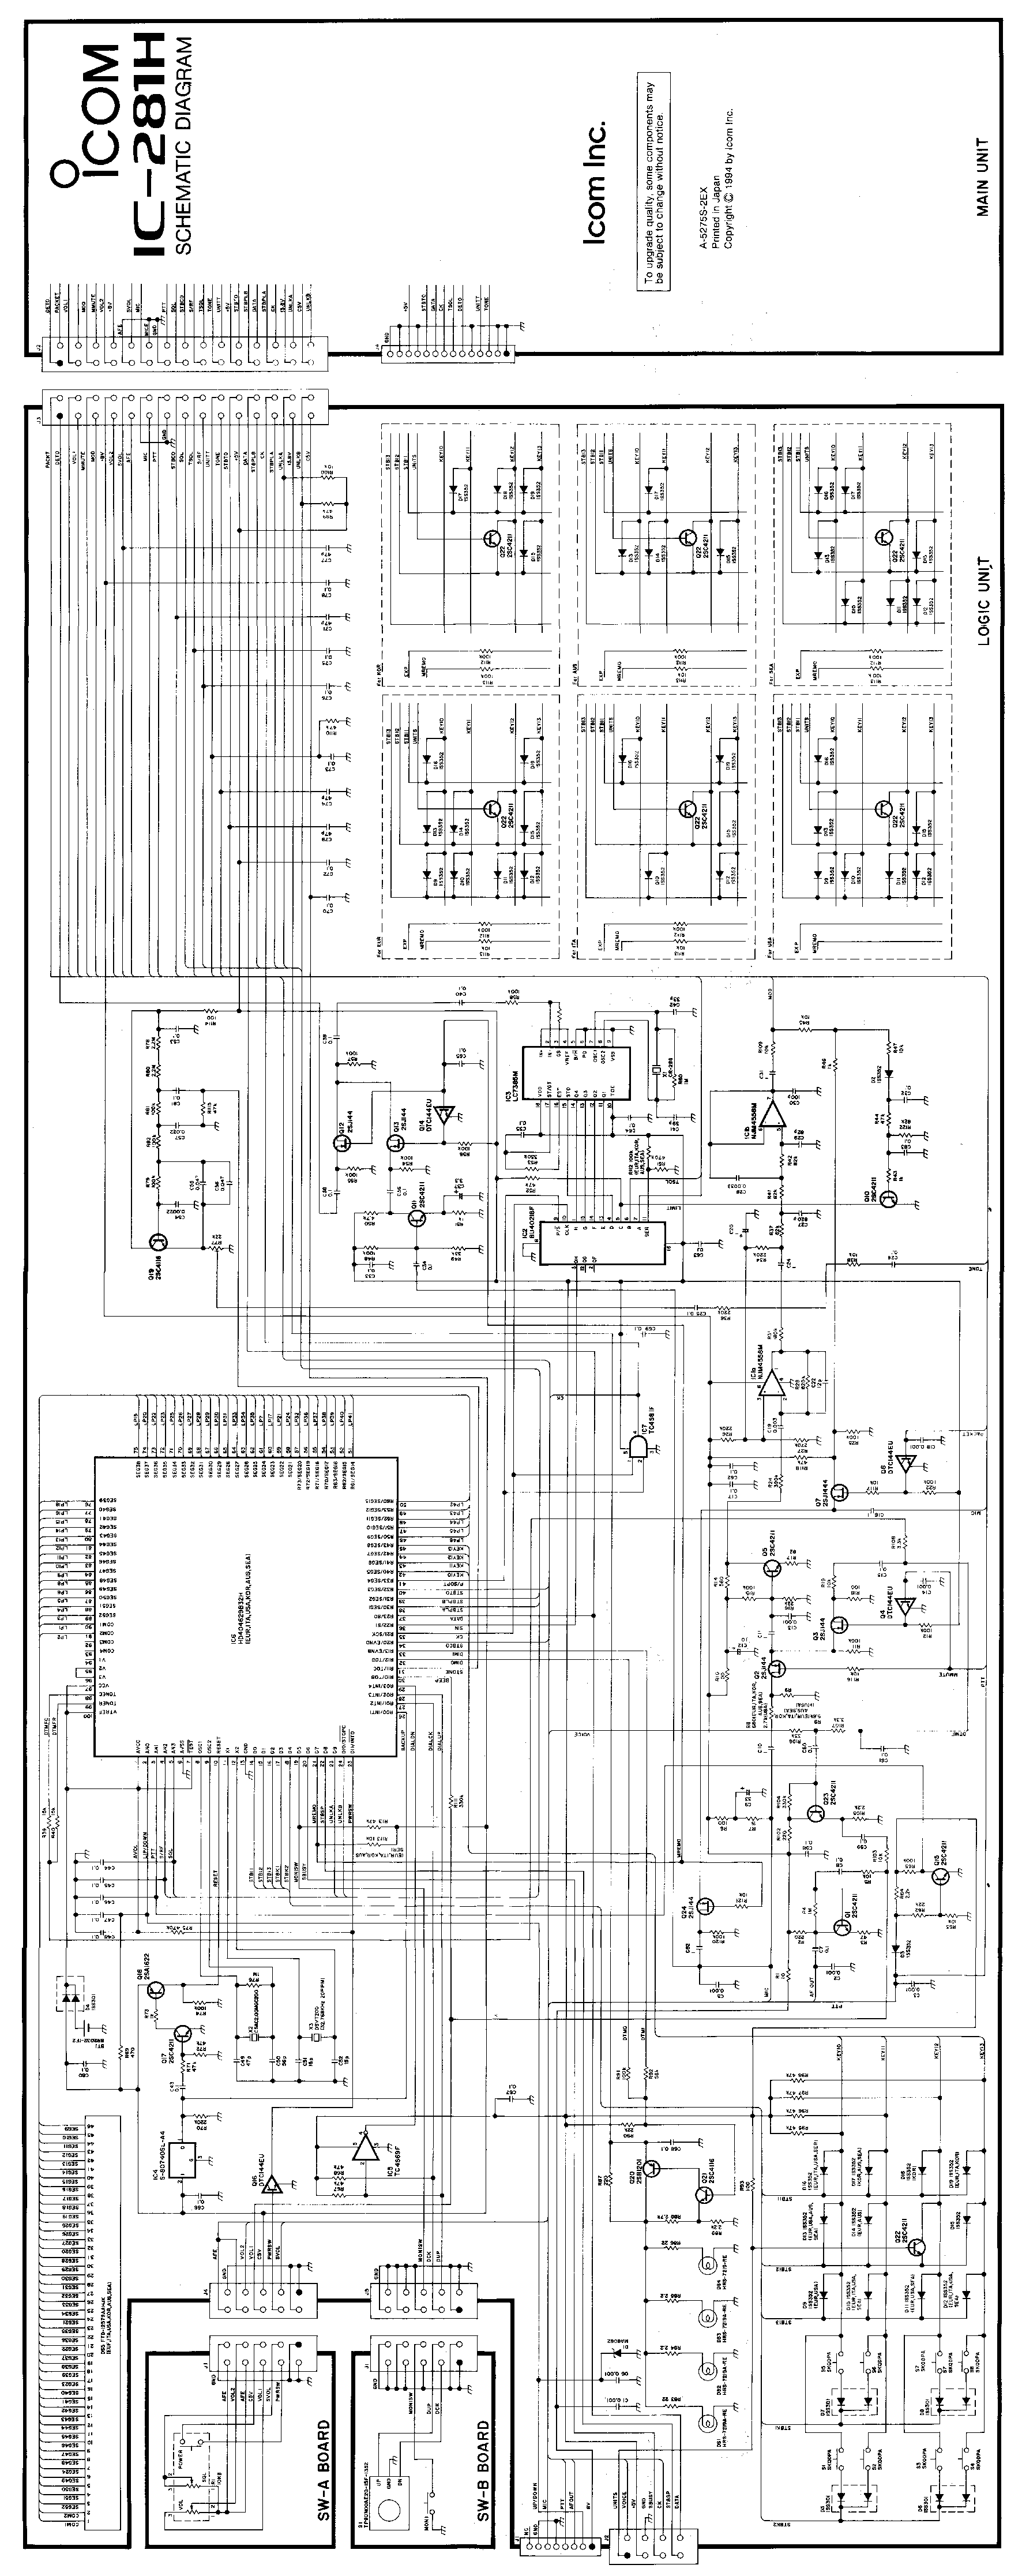 Icom Ic 281h manual